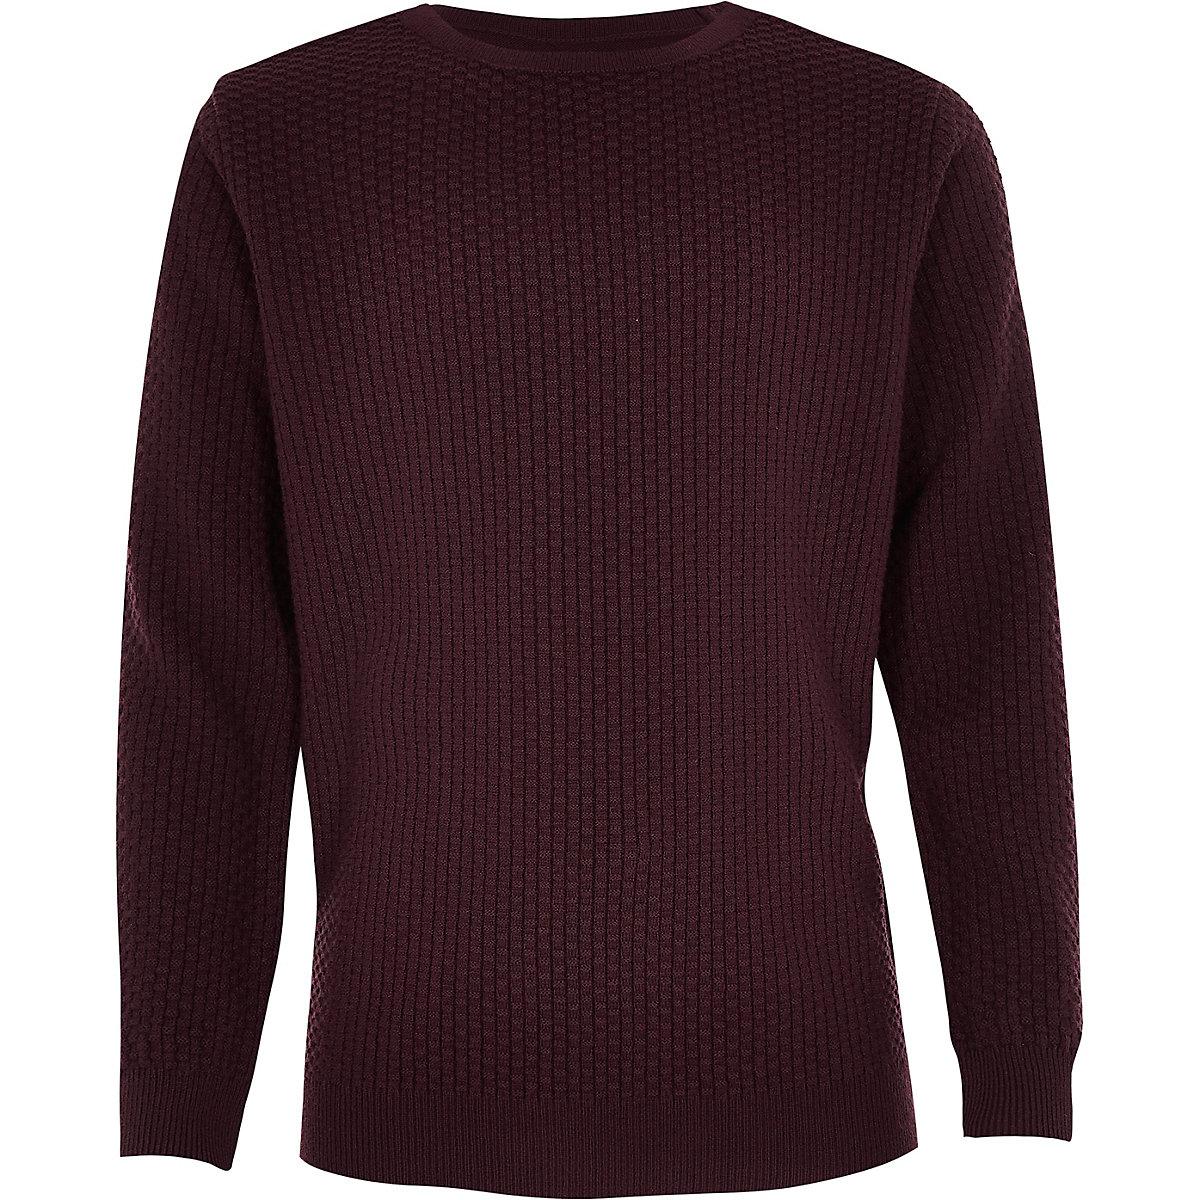 Boys burgundy textured sweater